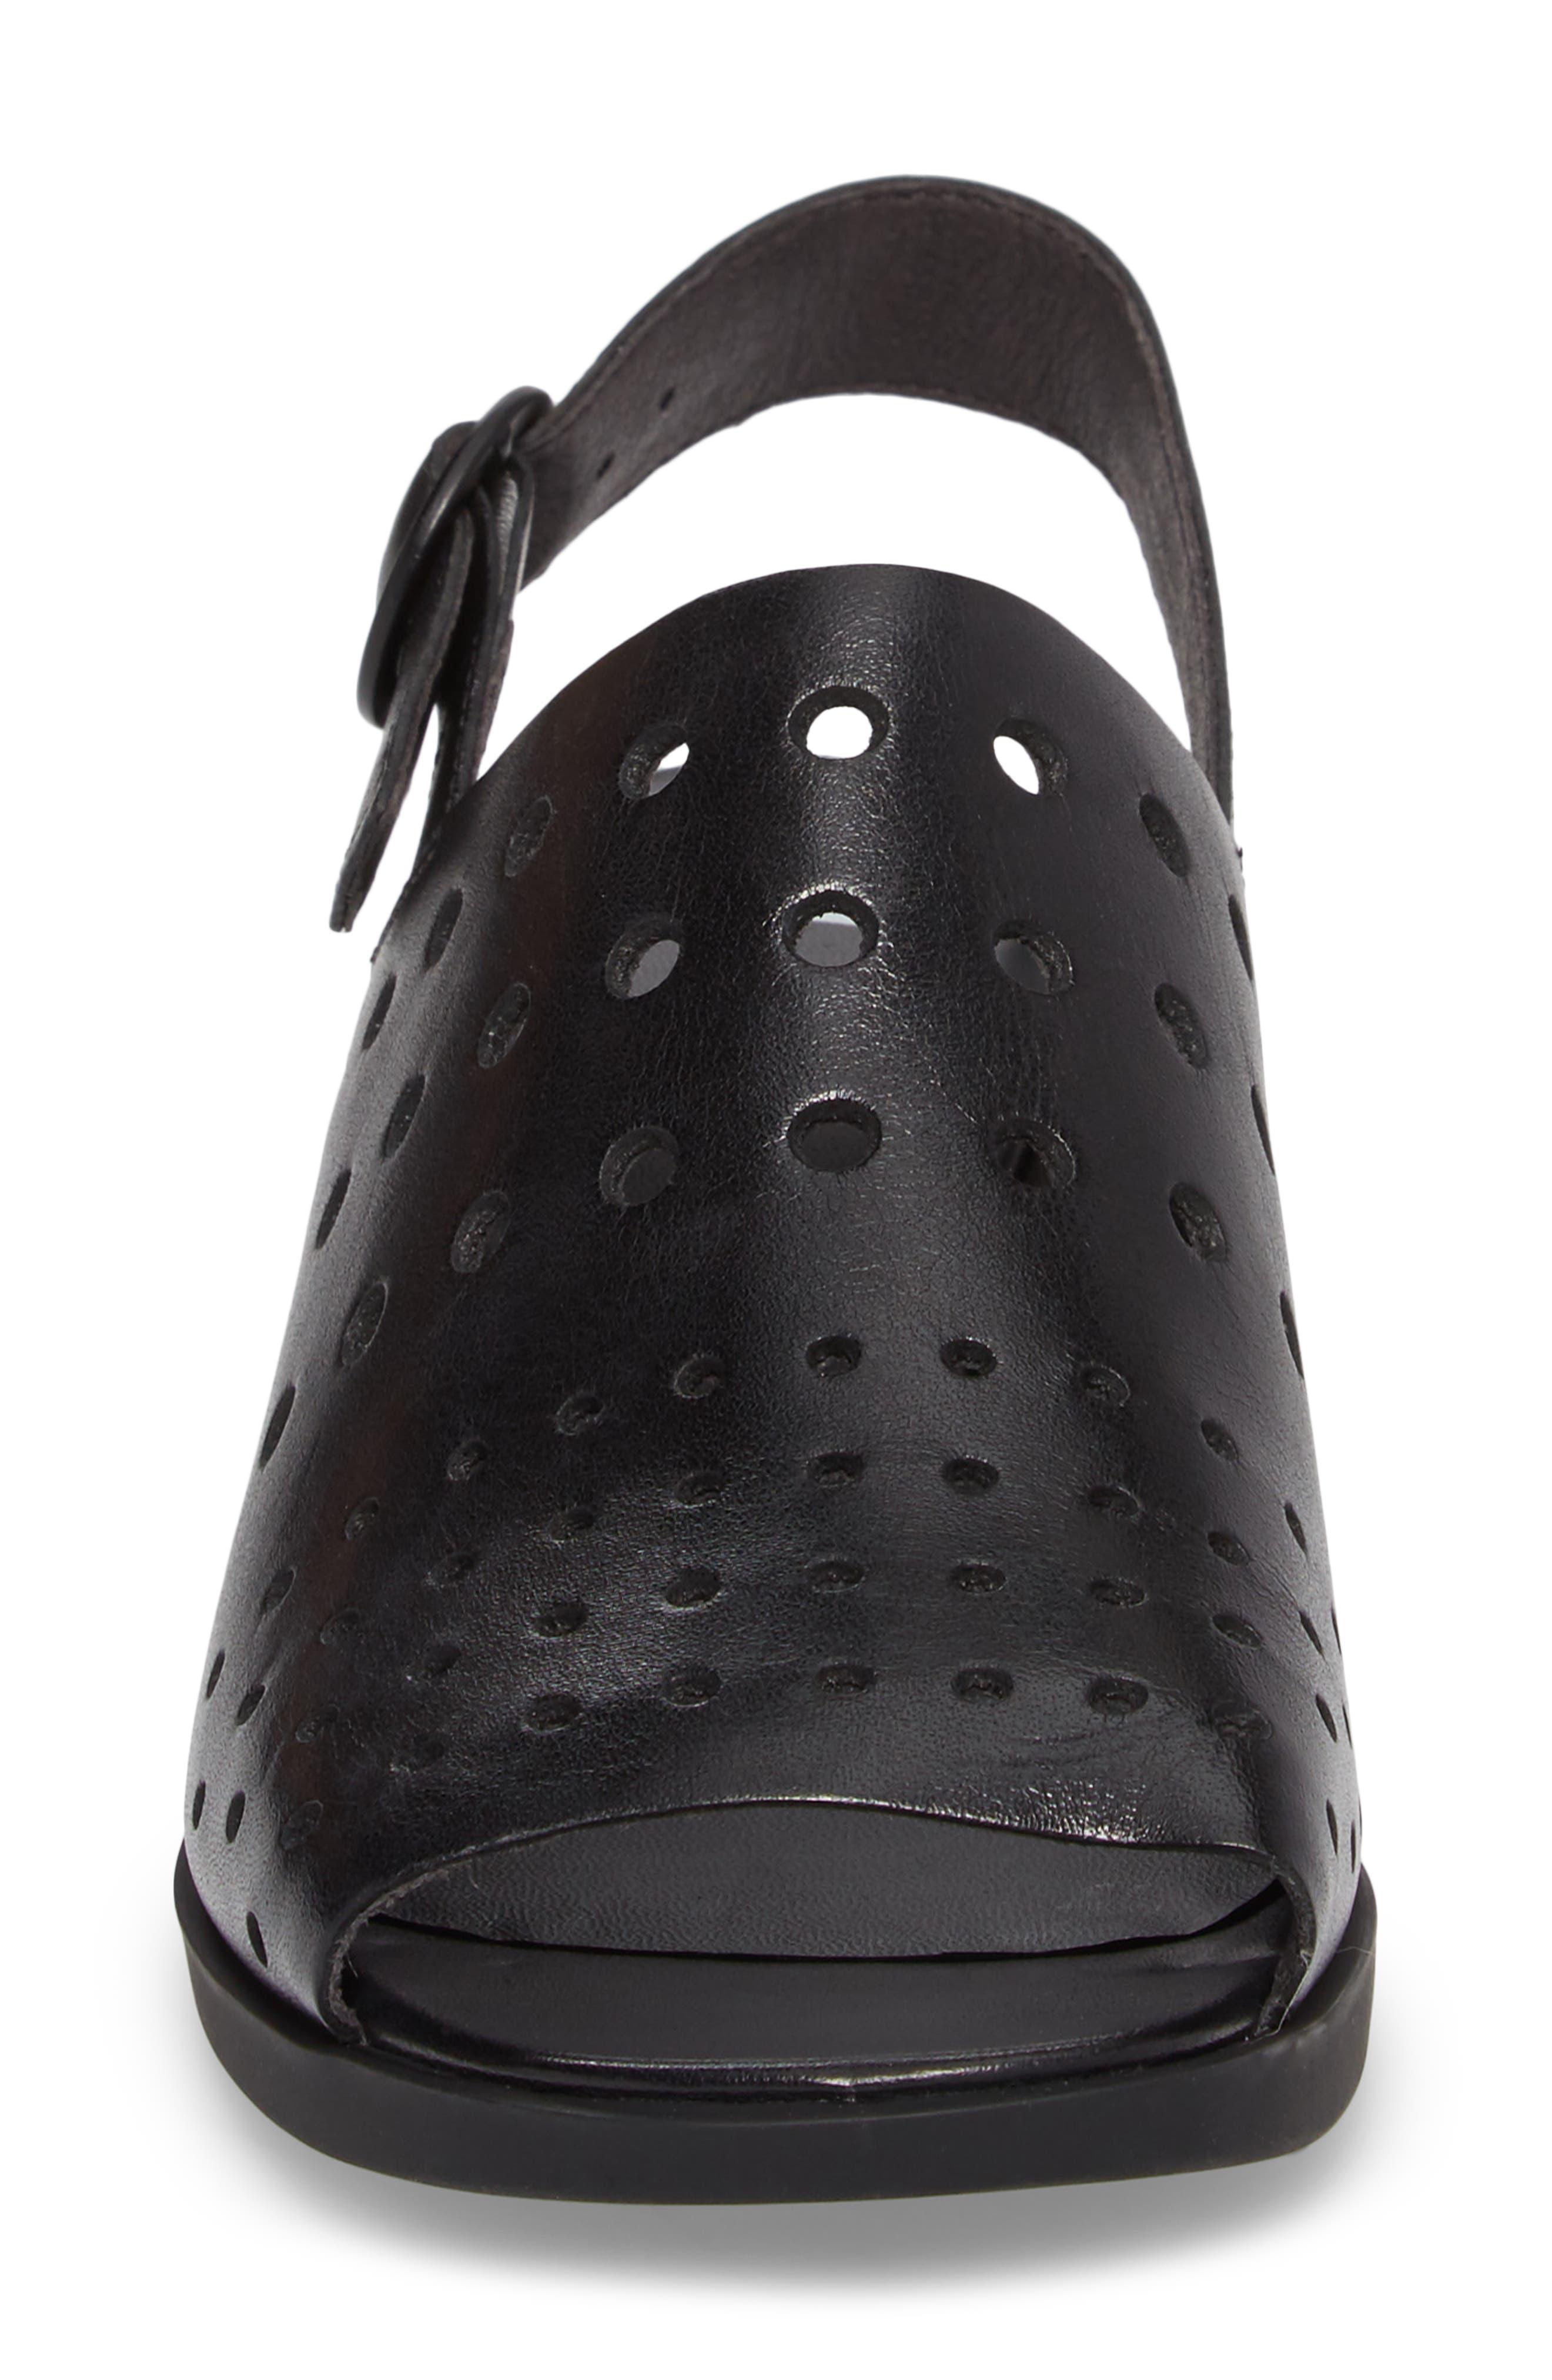 Twins Sandal,                             Alternate thumbnail 4, color,                             Black Leather